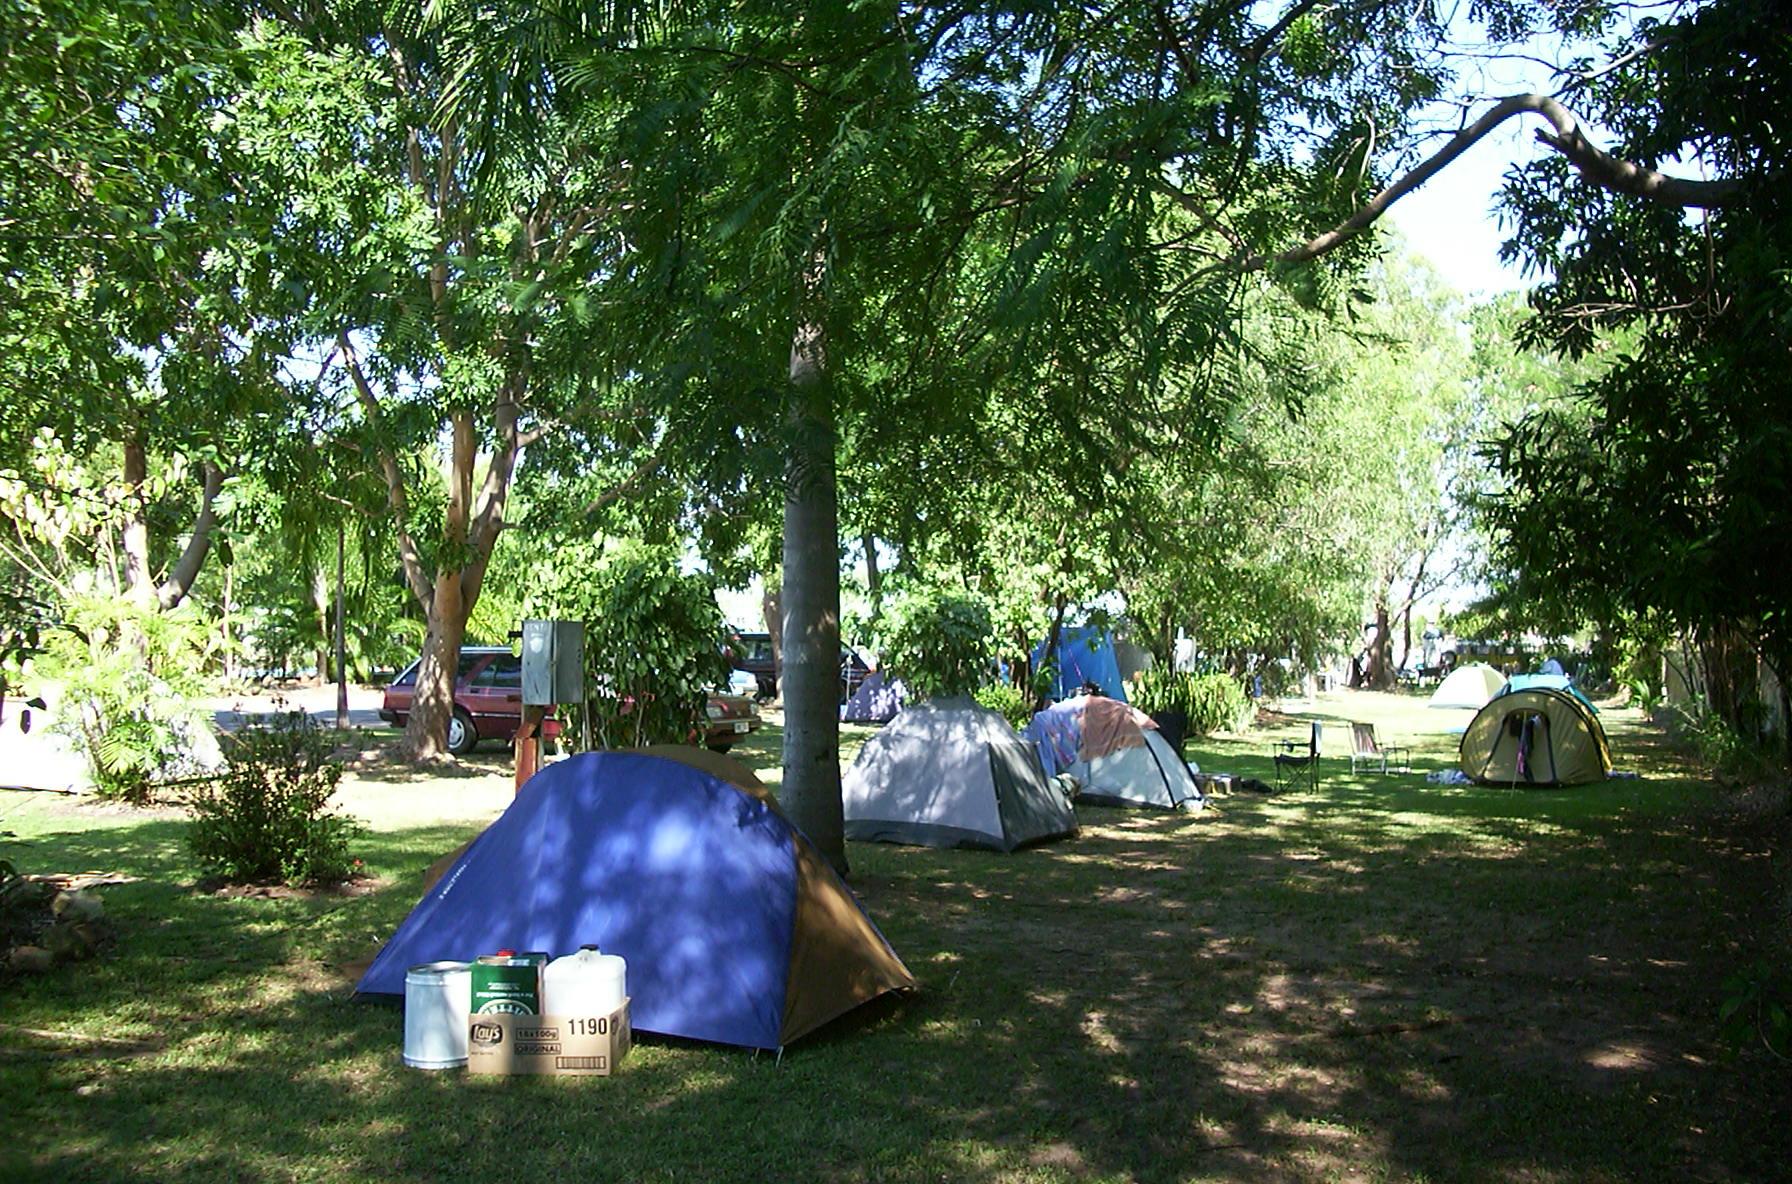 55 powered Caravan sites. Large shady camping area. Salt water pool ...